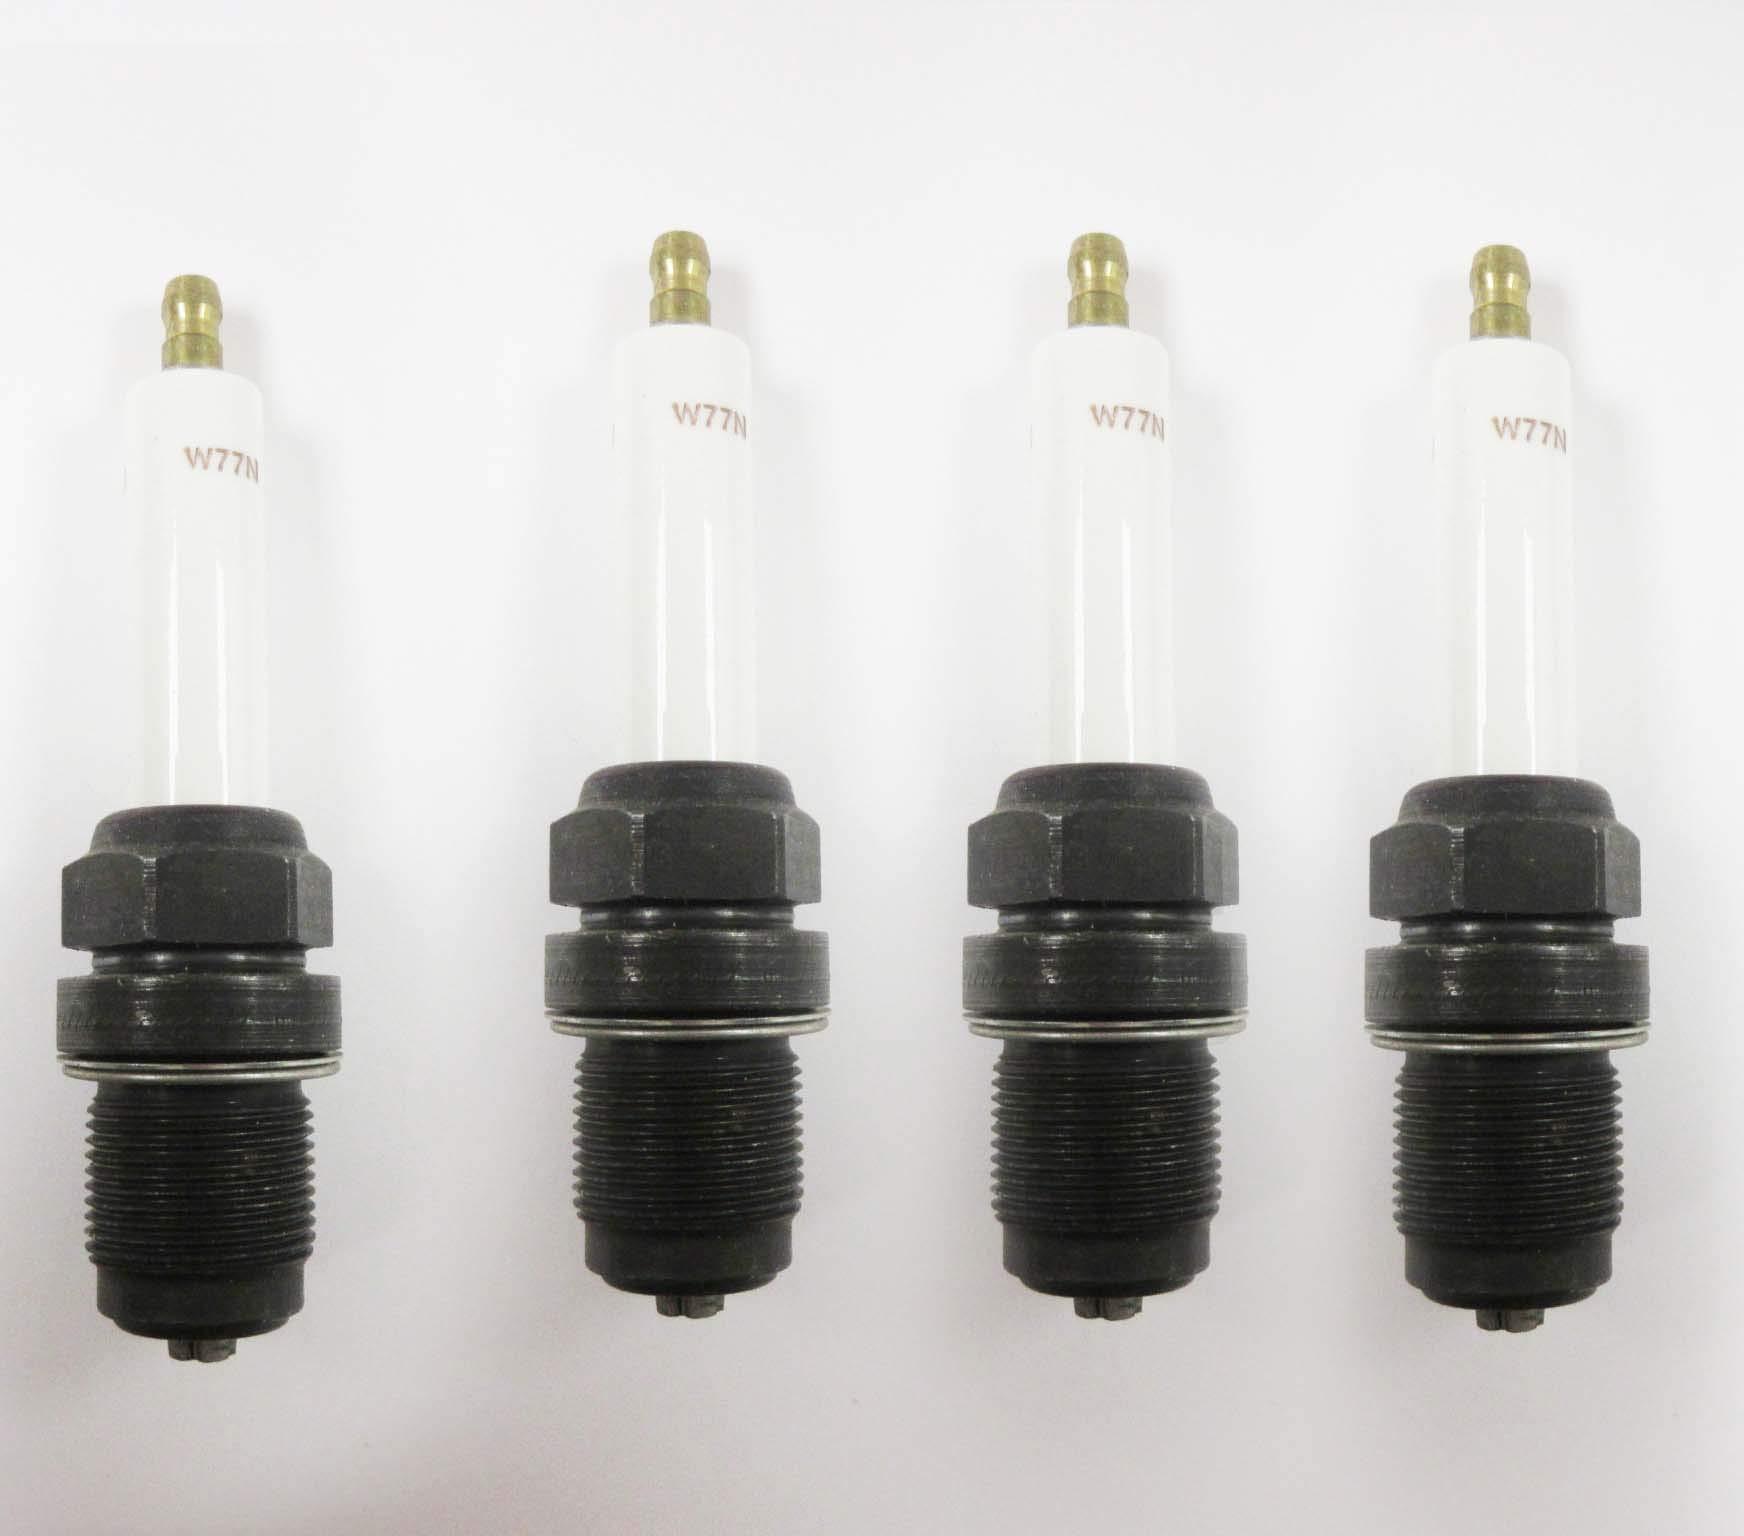 Champion 201 W77N Industrial Spark Plug Pack of 4